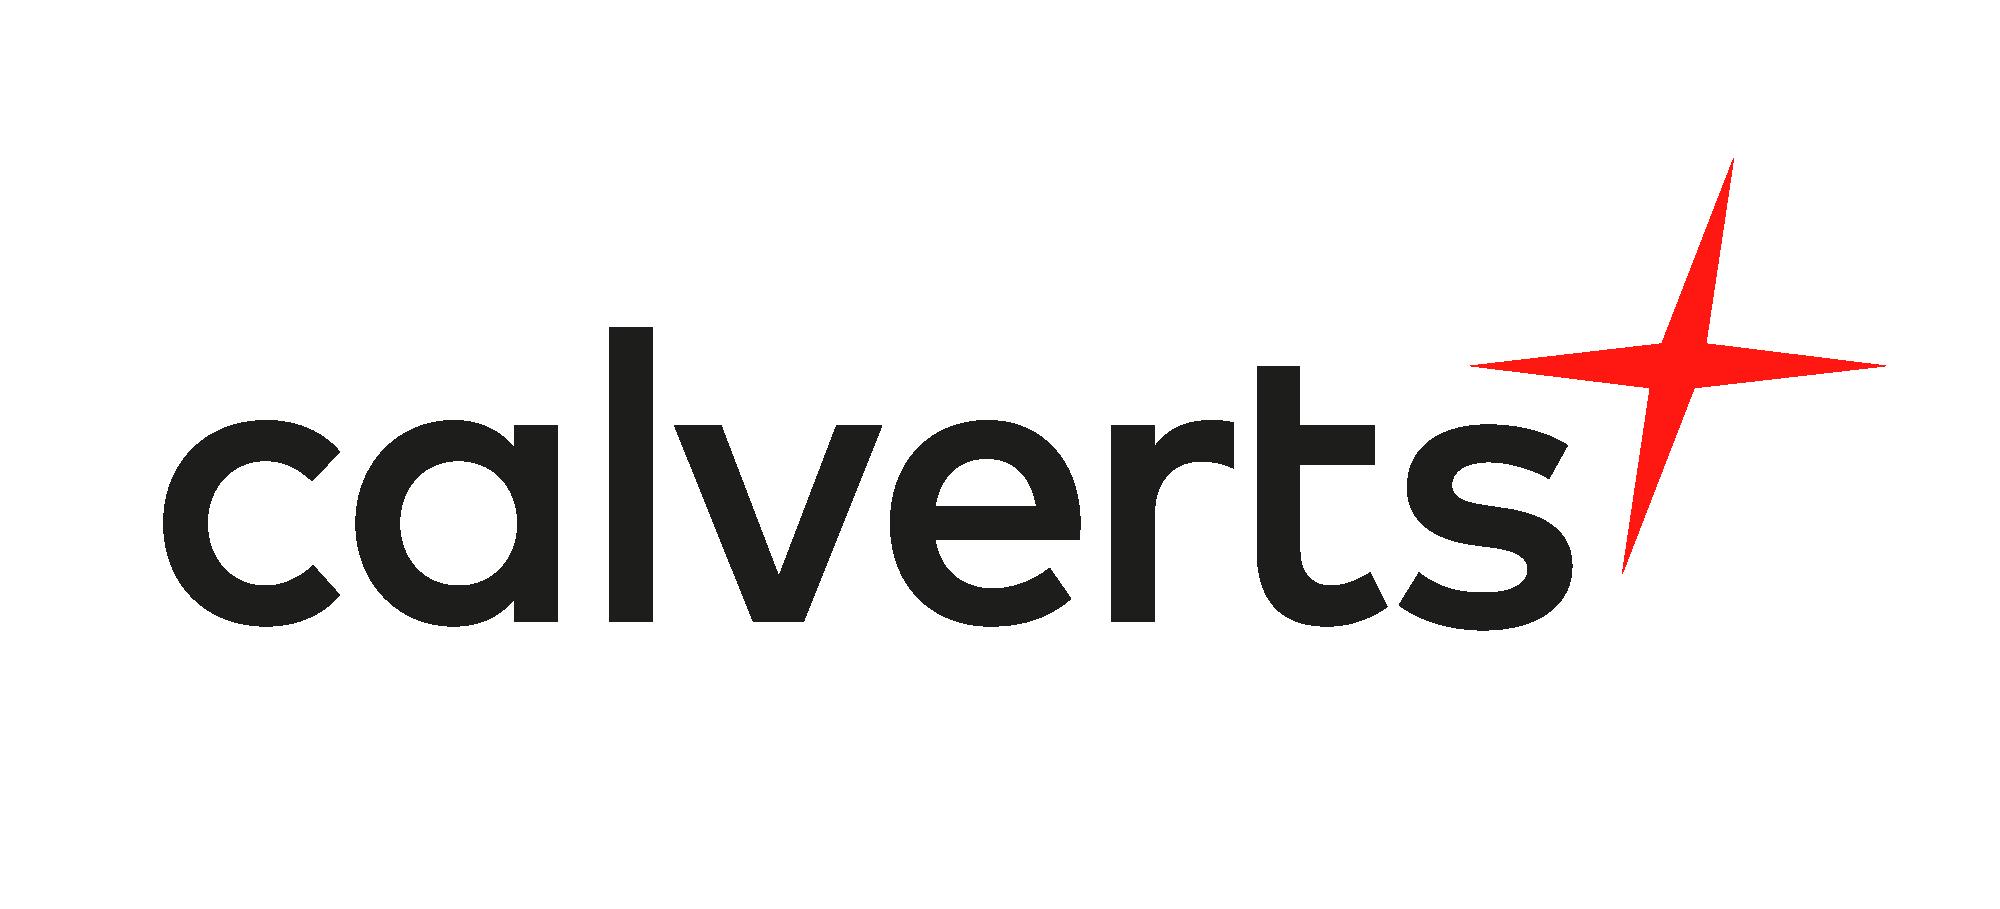 Calverts